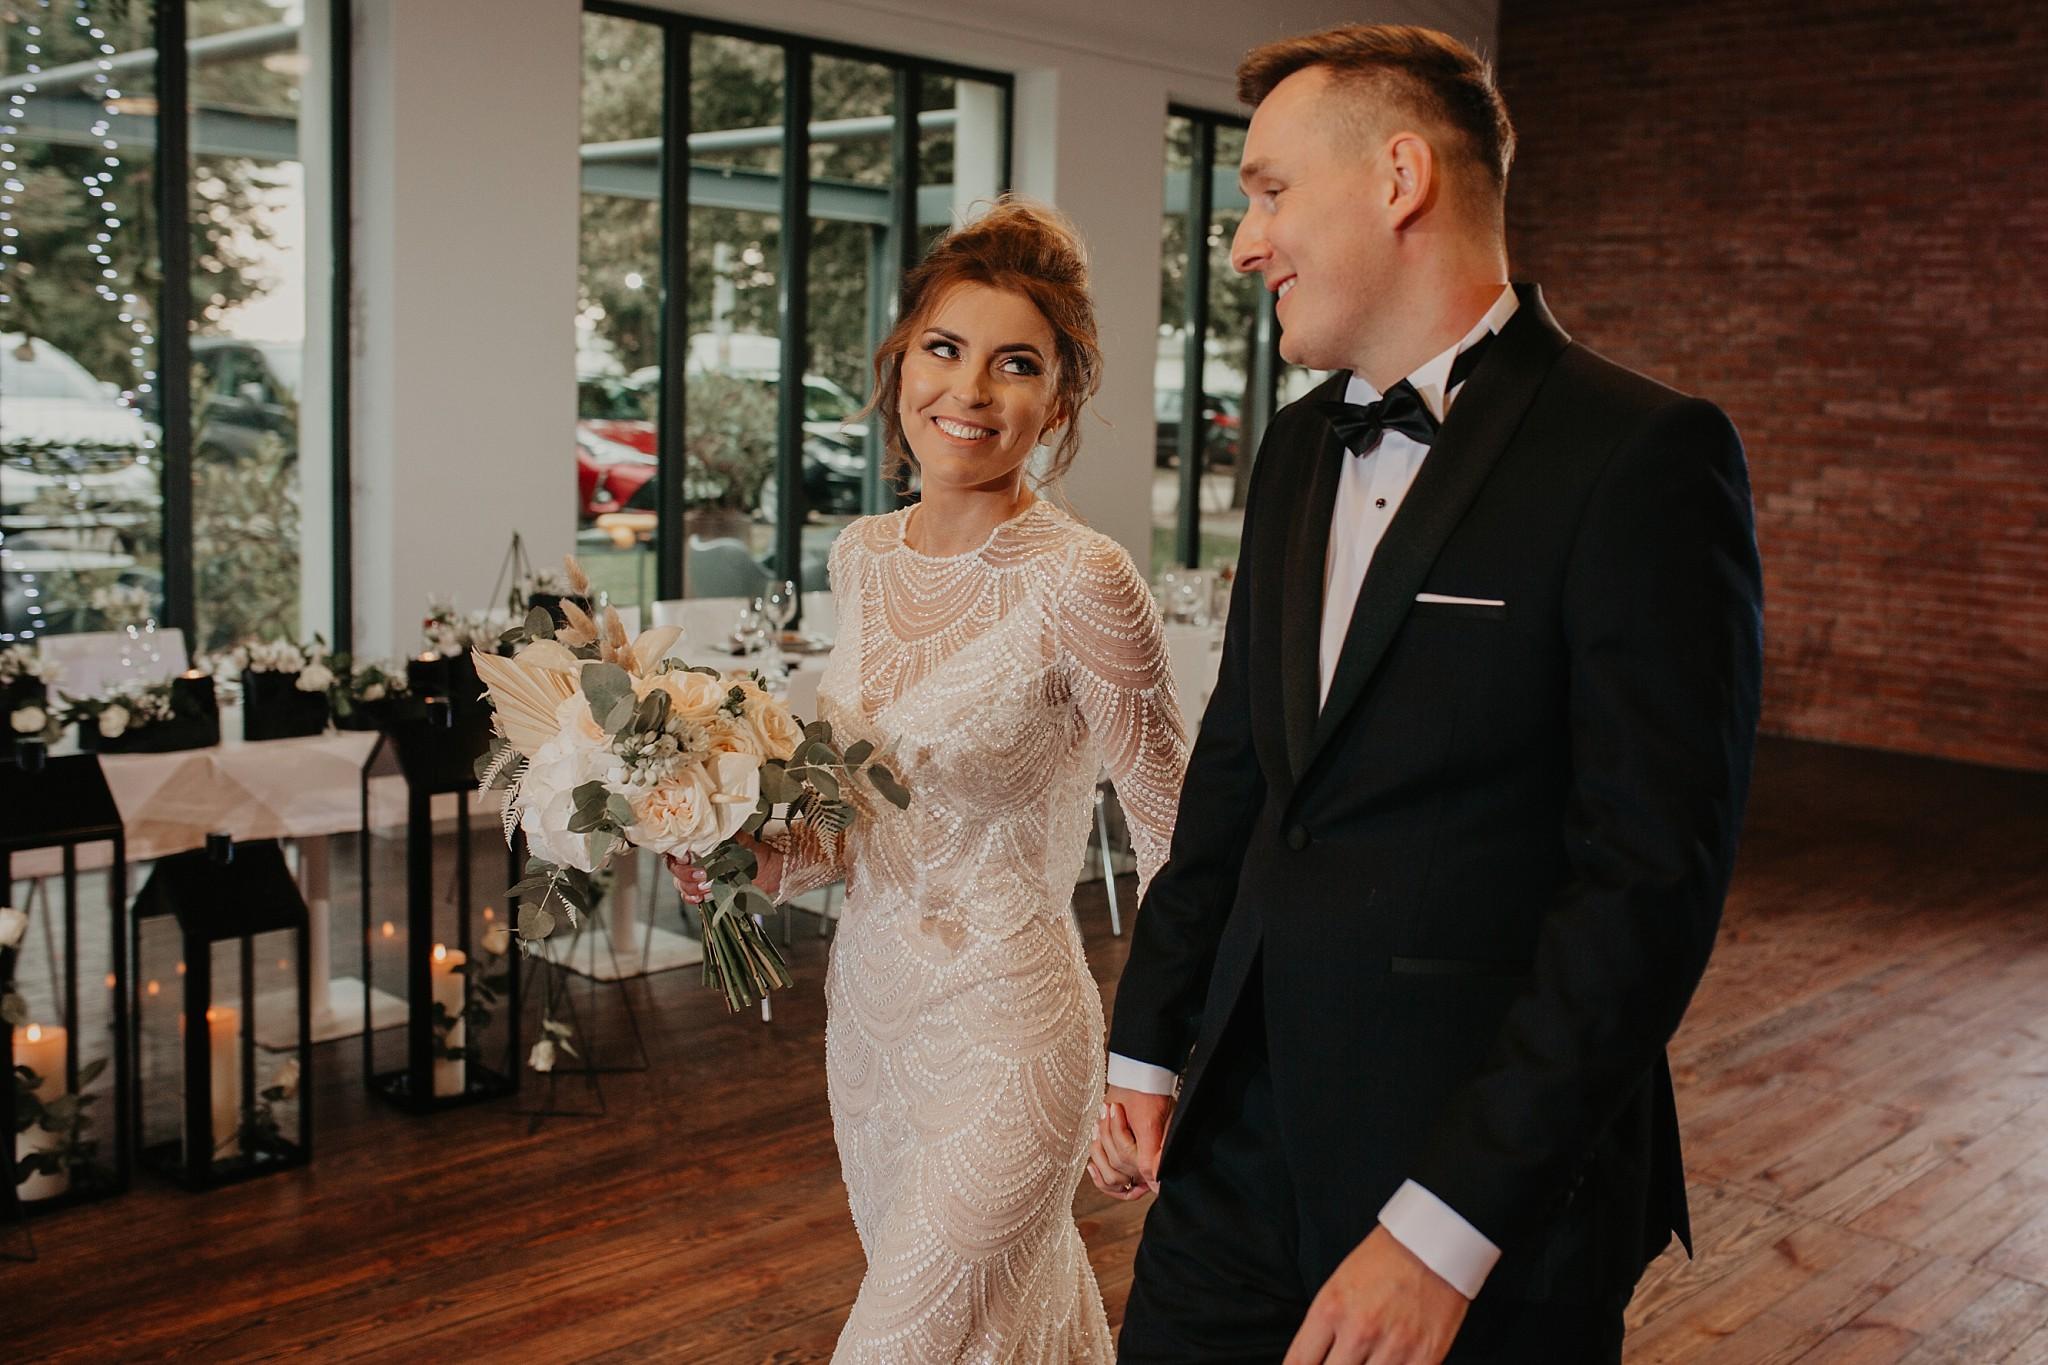 fotograf poznan wesele dobra truskawka piekne wesele pod poznaniem wesele w dobrej truskawce piekna para mloda slub marzen slub koronawirus slub listopad wesele koronawirus 271